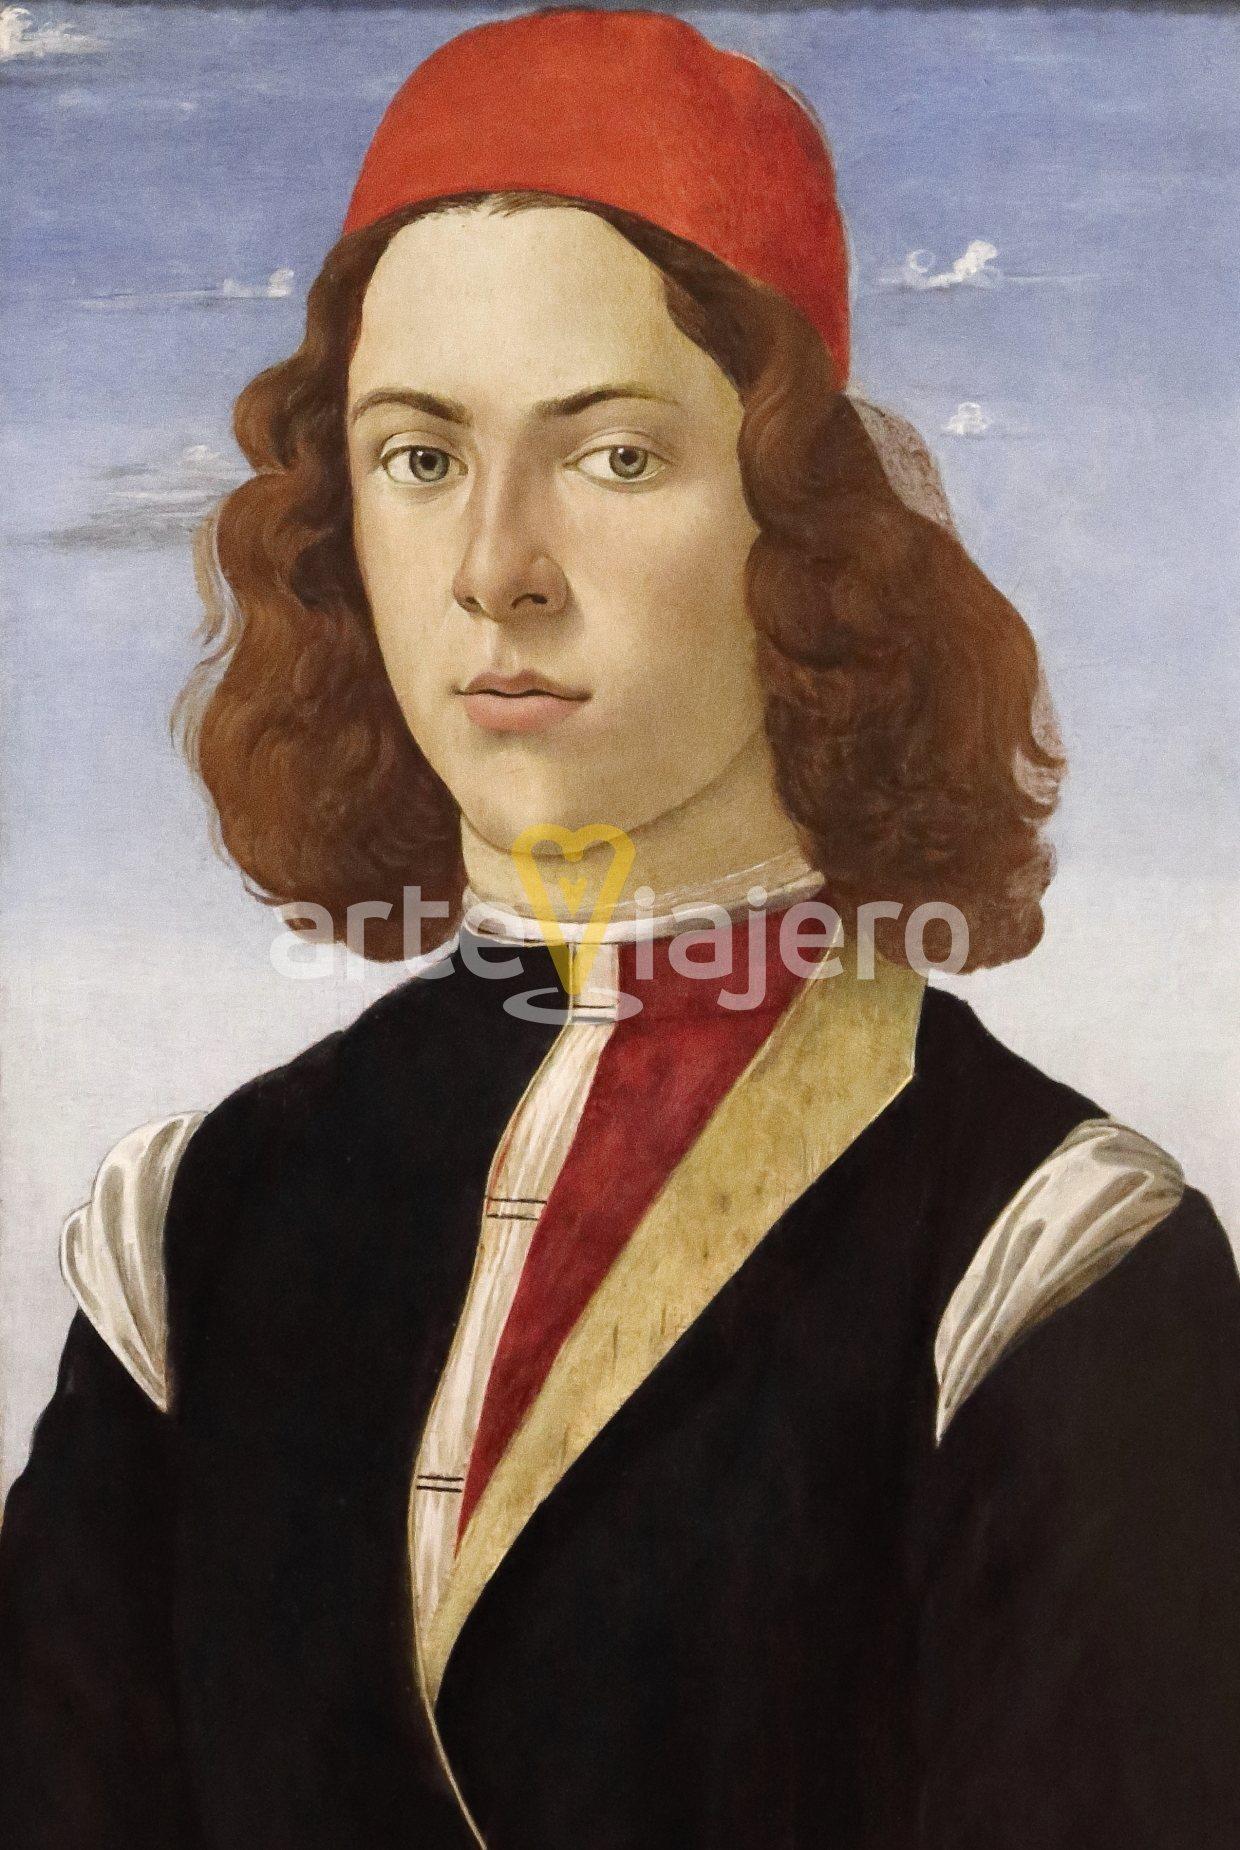 retrato de hombre joven botticelli